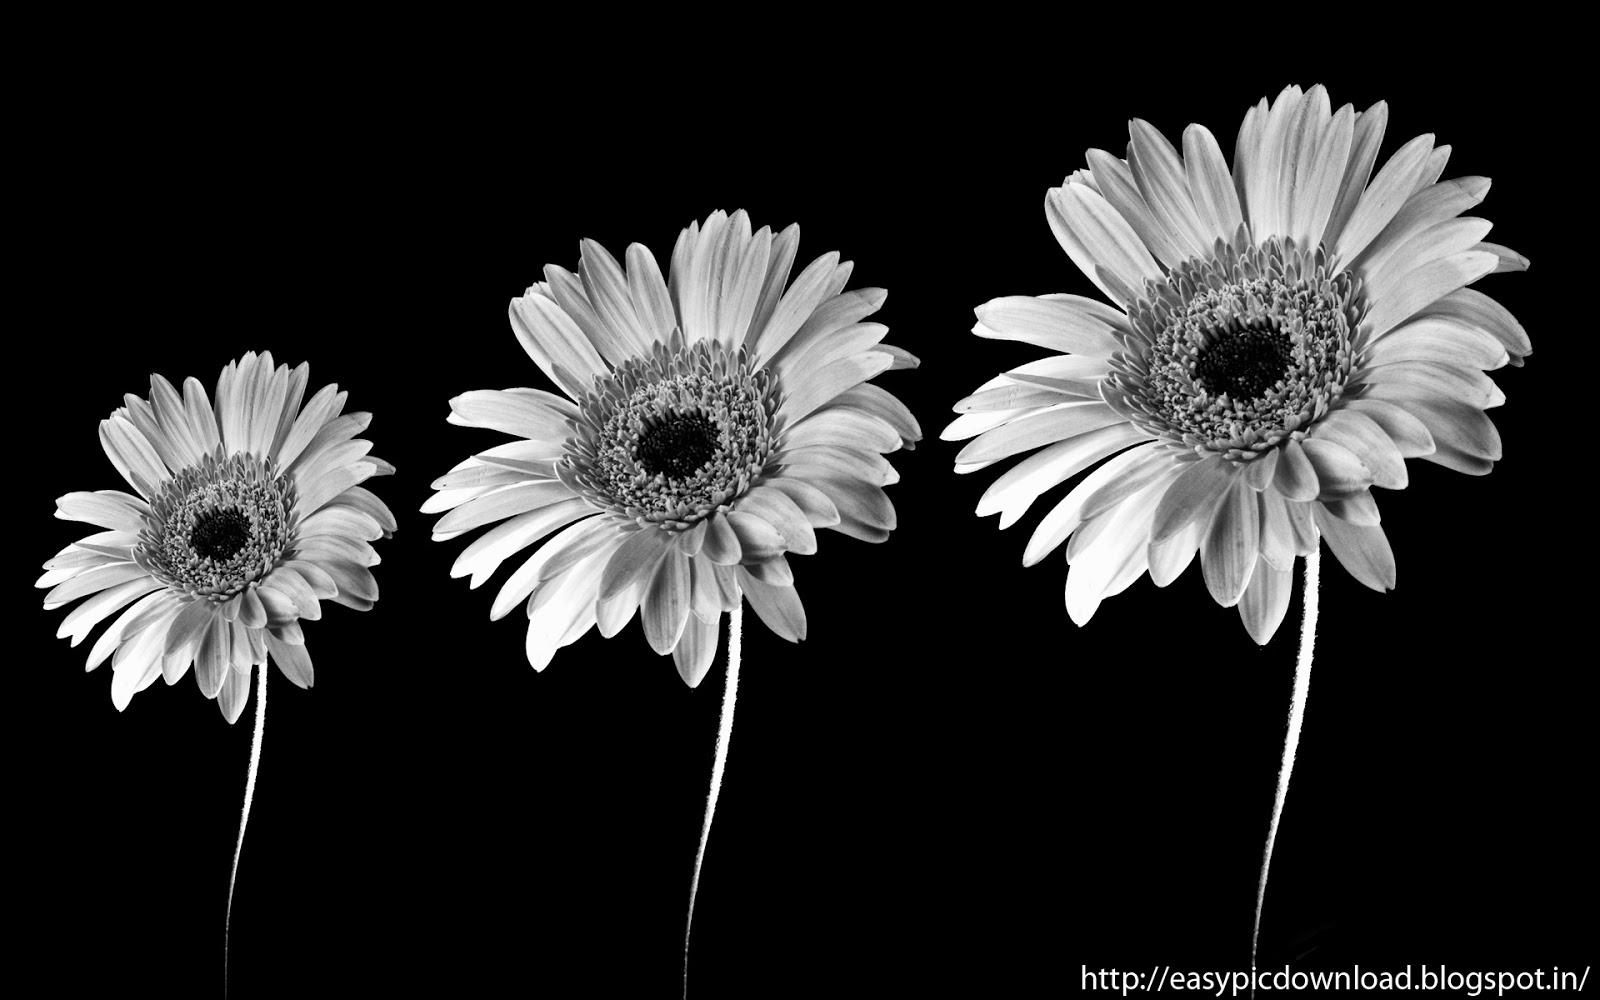 Flowers Black and White – Art Photo Web Studio |Flower Pictures Black And White